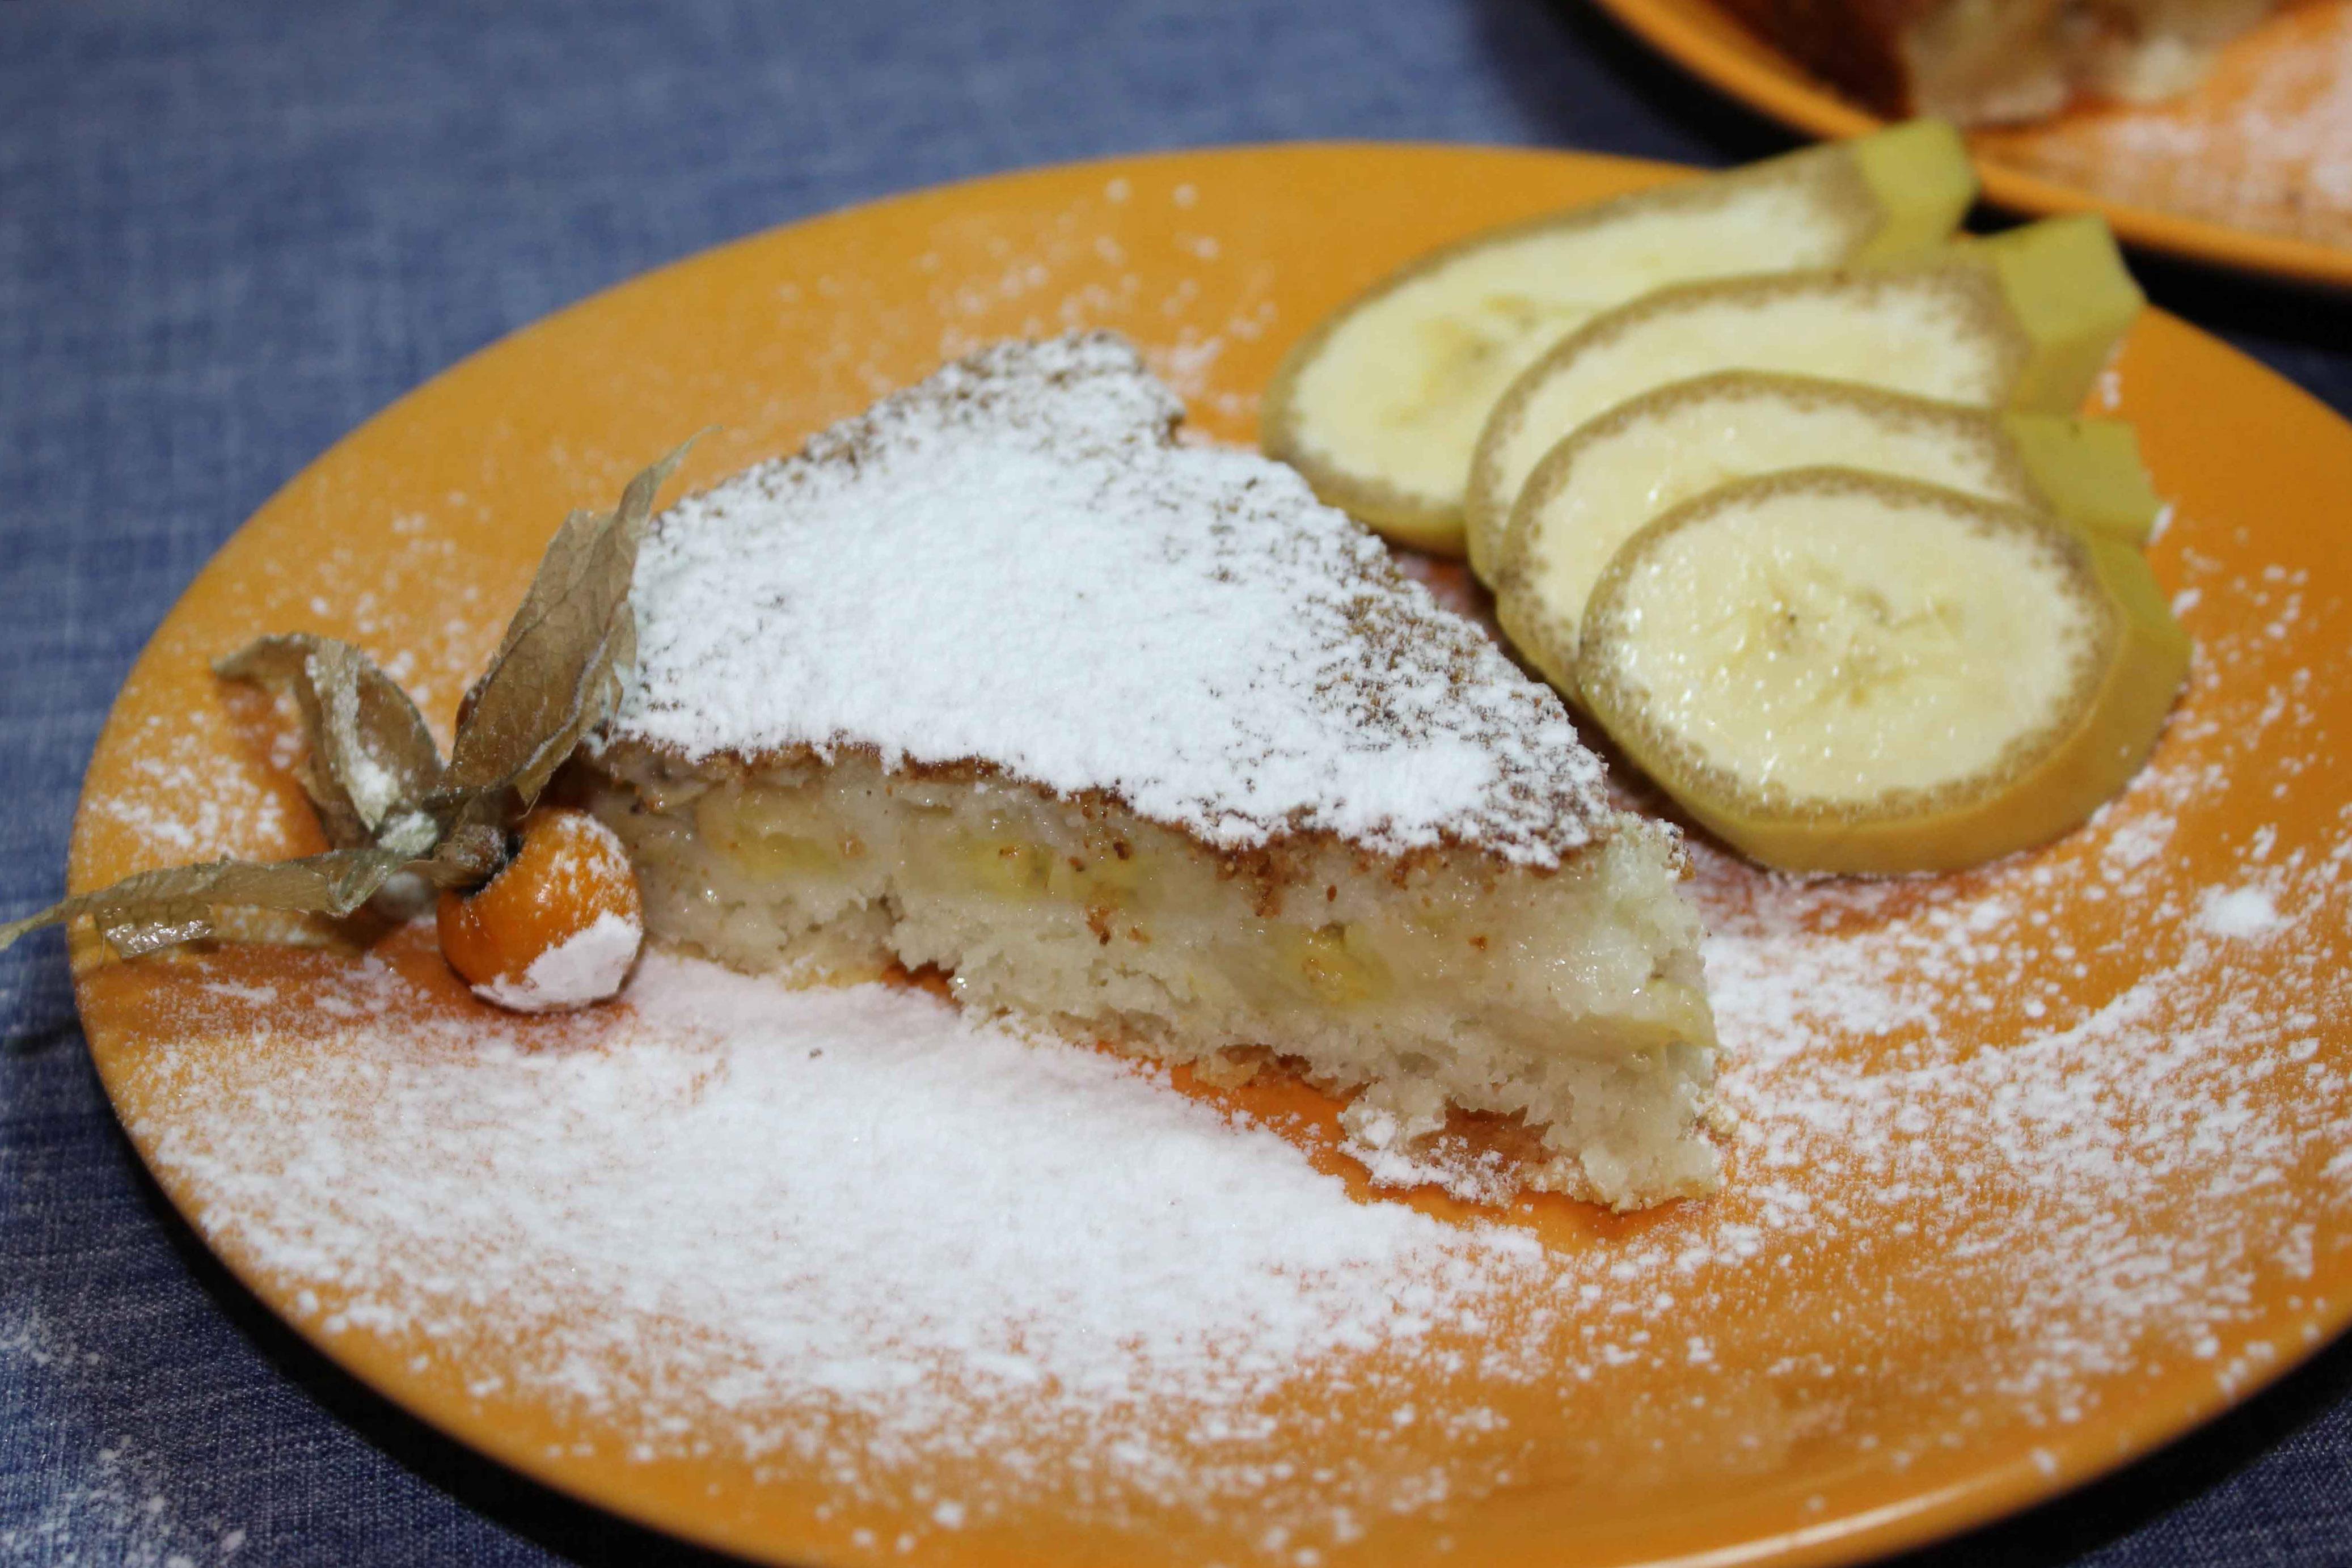 mannik-s-bananom